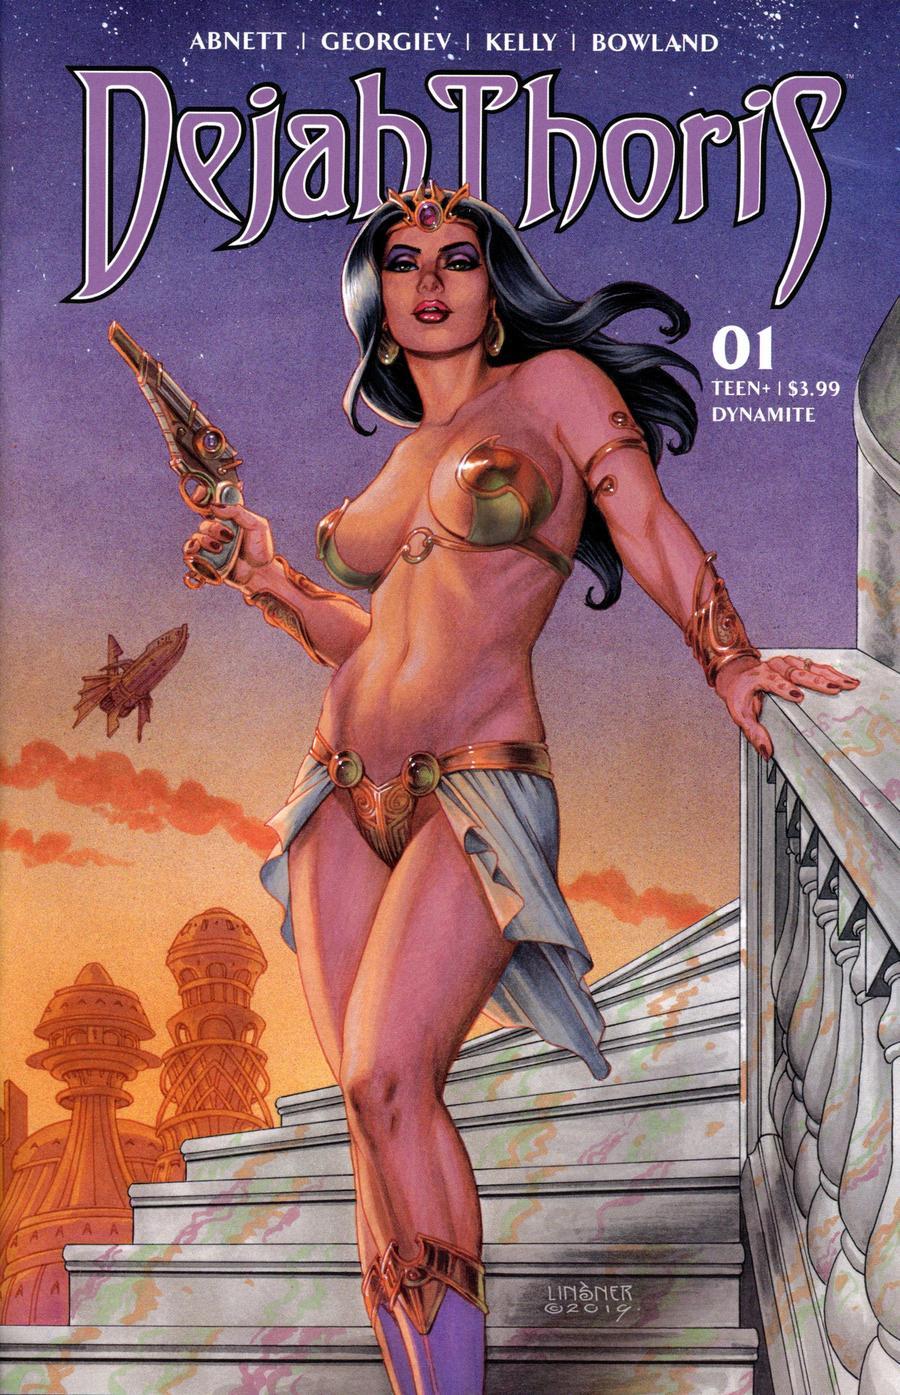 Dejah Thoris Vol 3 #1 Cover B Variant Joseph Michael Linsner Cover